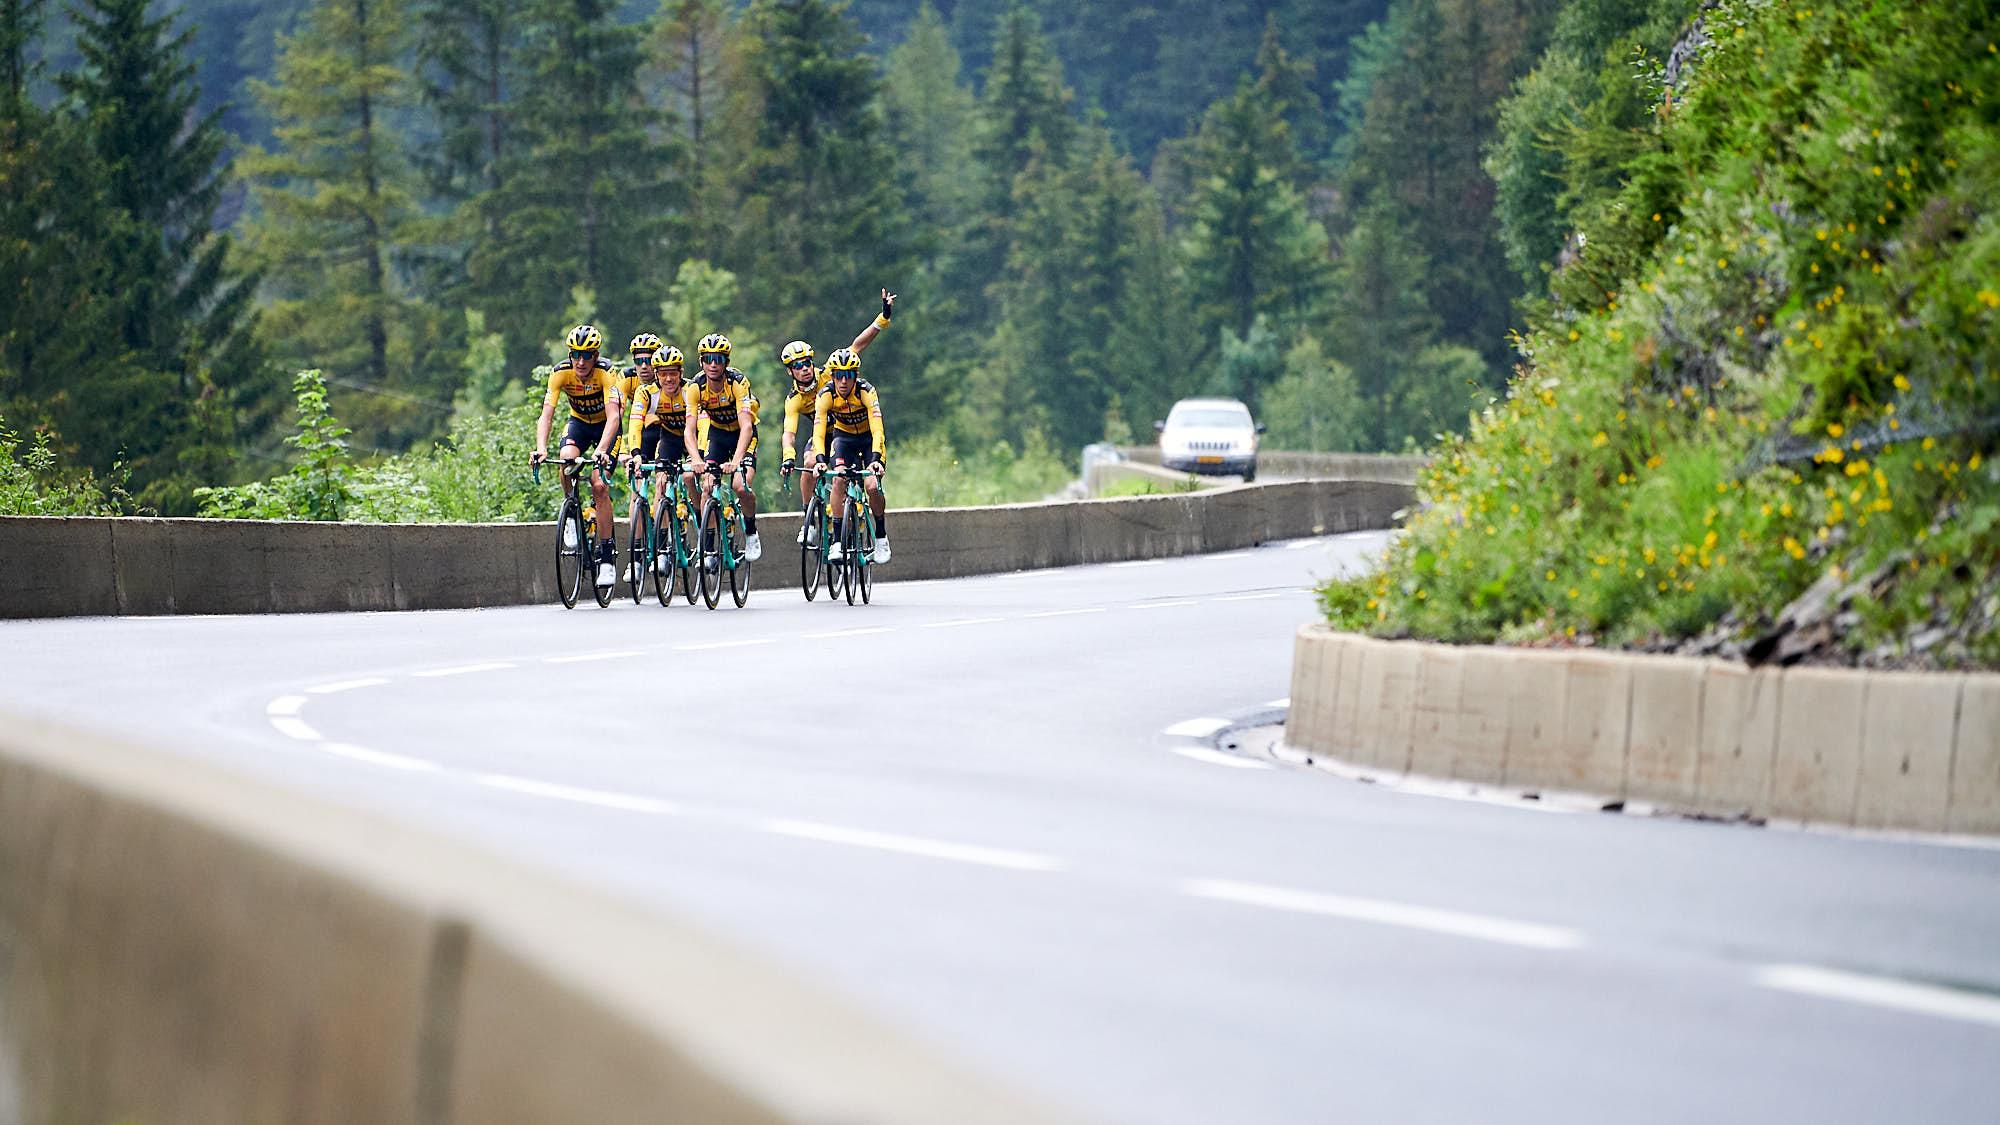 Team Jumbo-Visma's Tour de France cyclists training